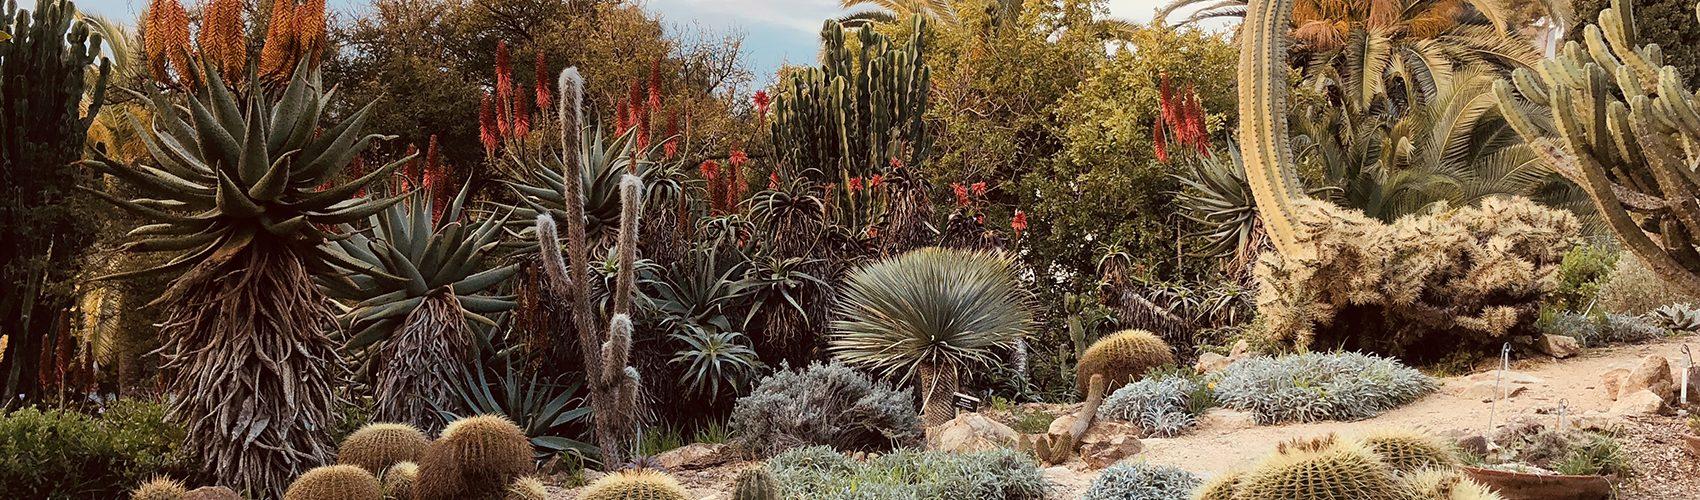 Cactus Jardí Botànic Marimurtra Costa Brava